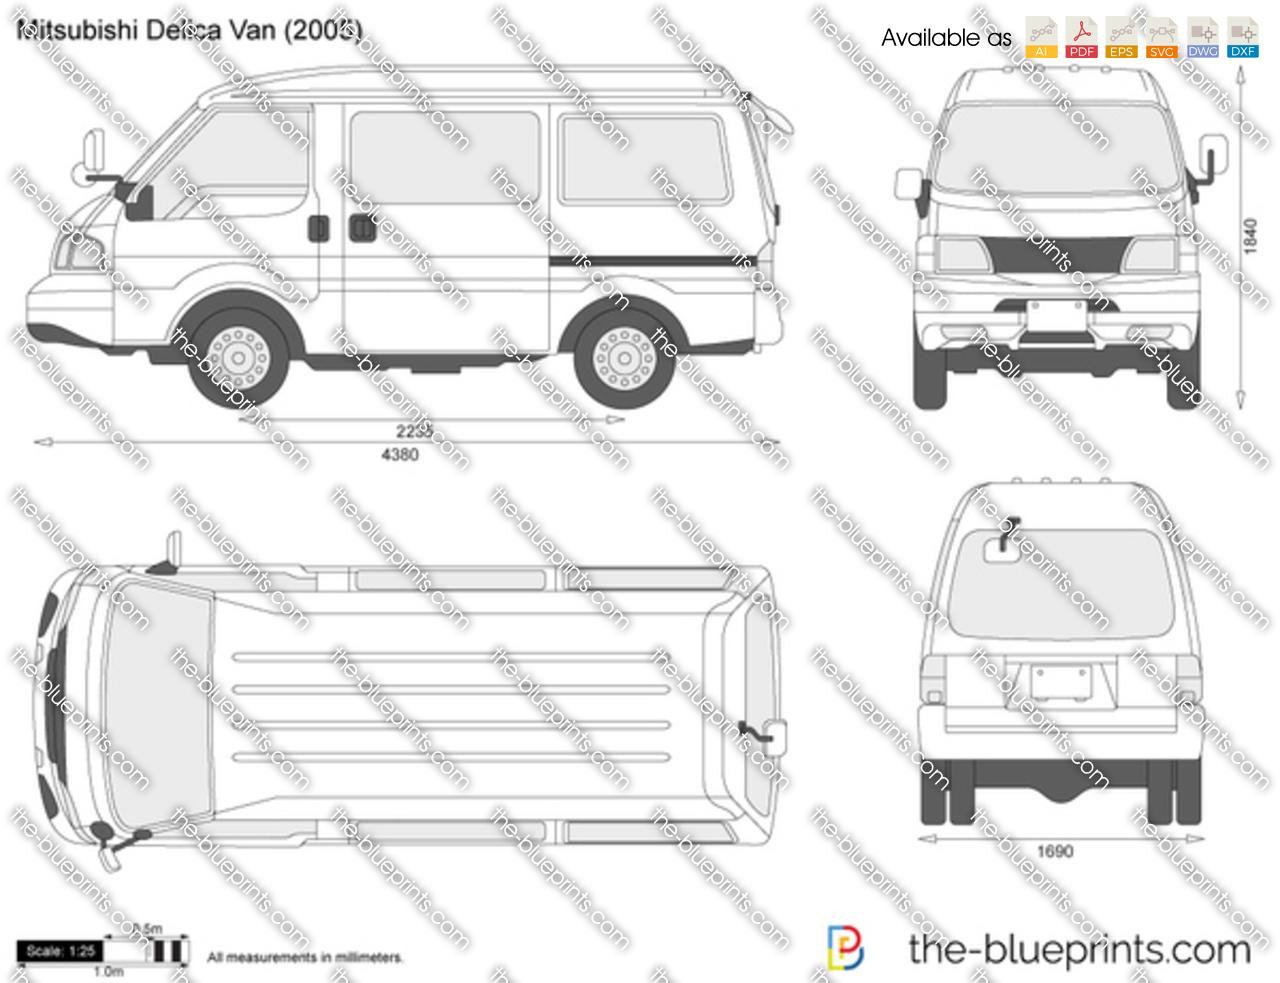 Mitsubishi Delica Van 1999